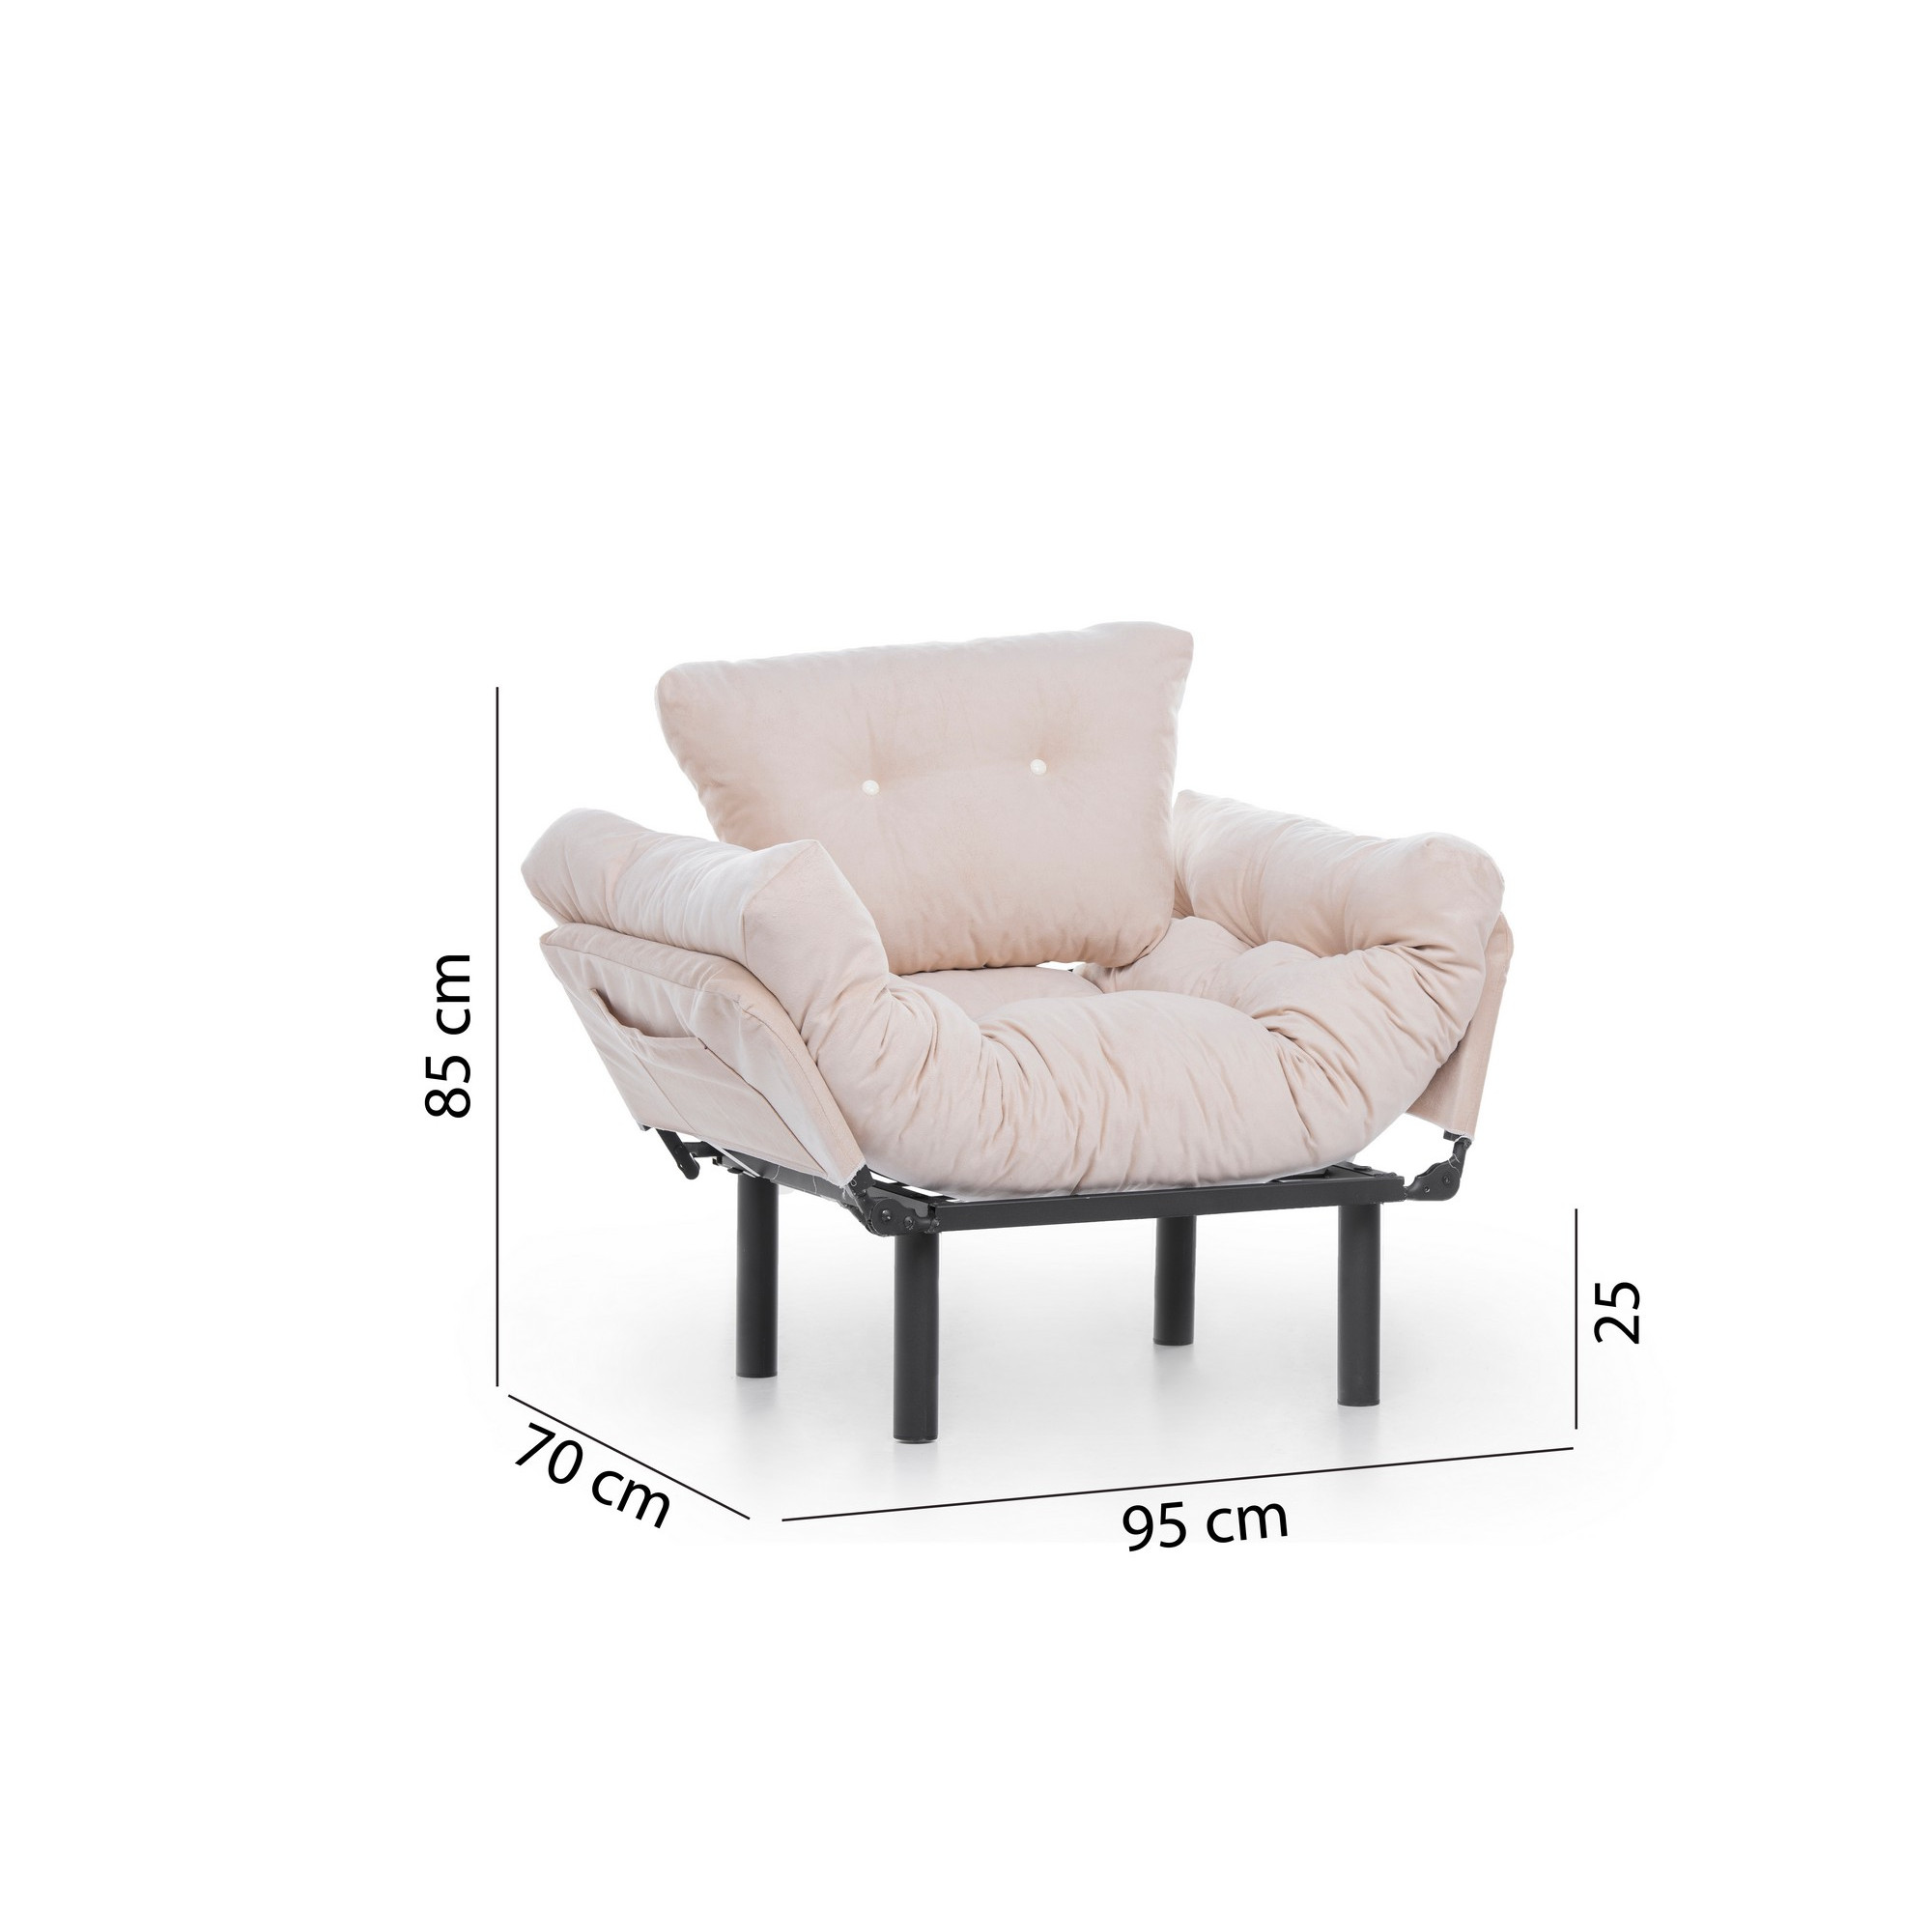 1 Seater Sofa Bed Nitta | Cream